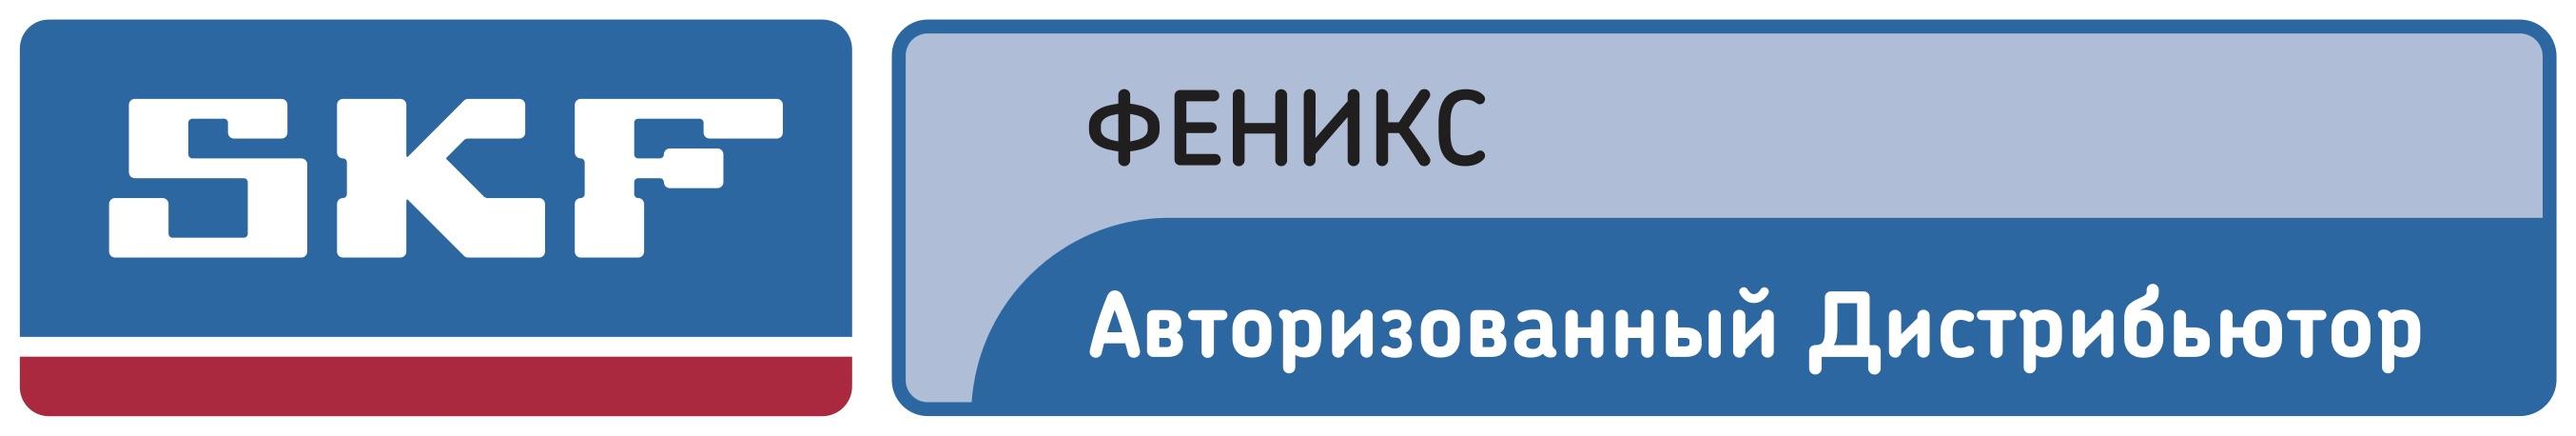 Корпоративный портал для ООО «Феникс»